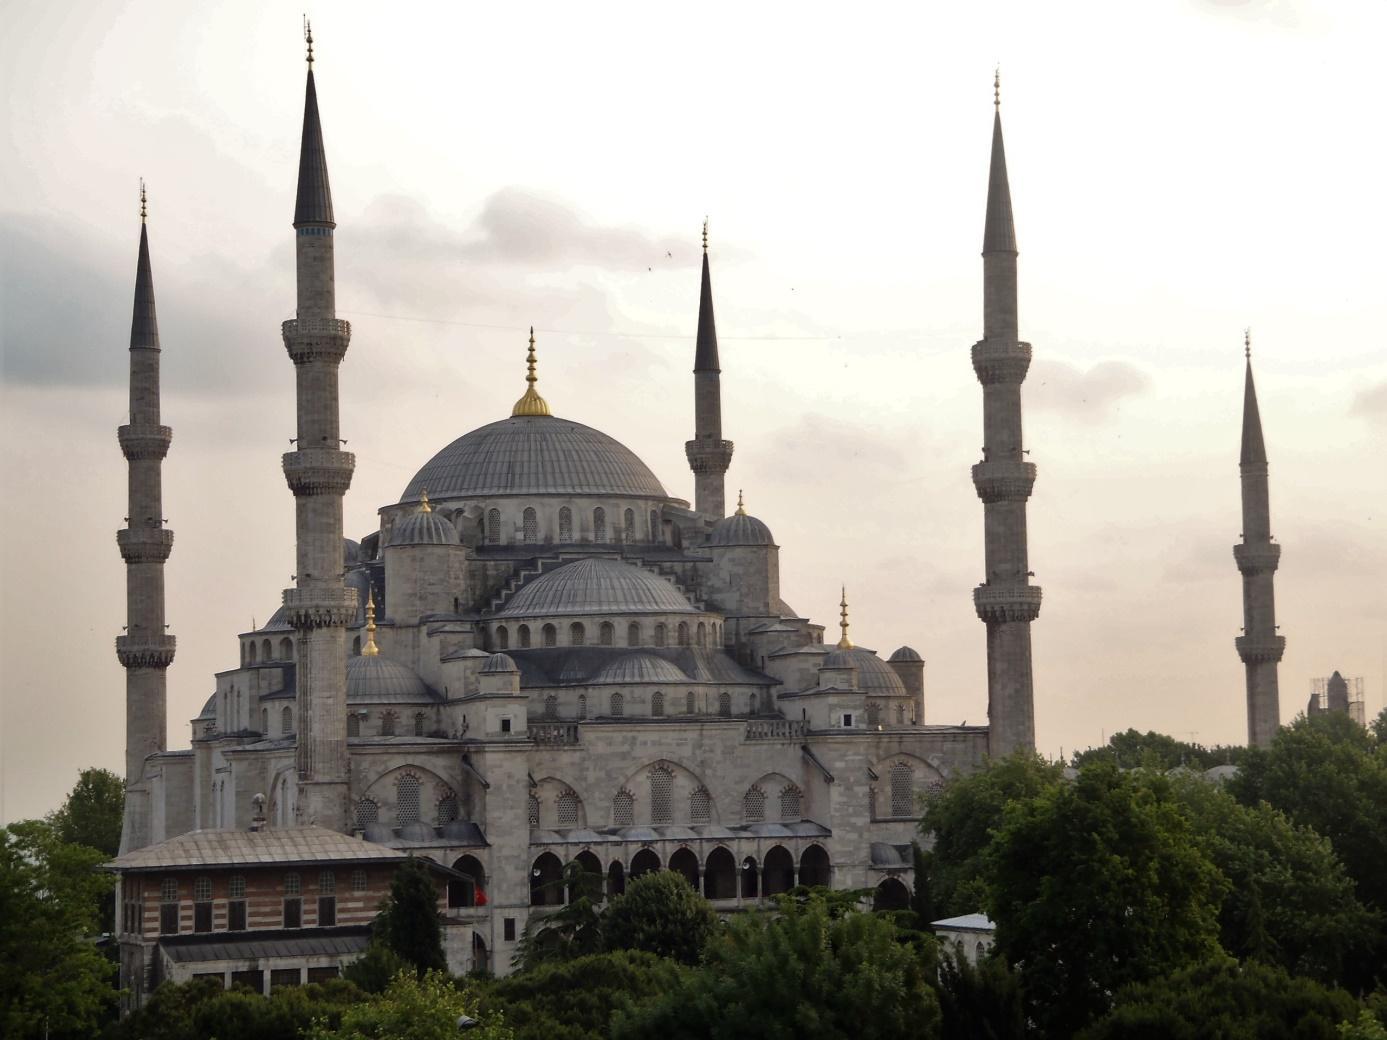 C:\Users\Administrator\Documents\Documents\Putovanja\PUTOPISI\TURSKA\2\Slike\11.jpg